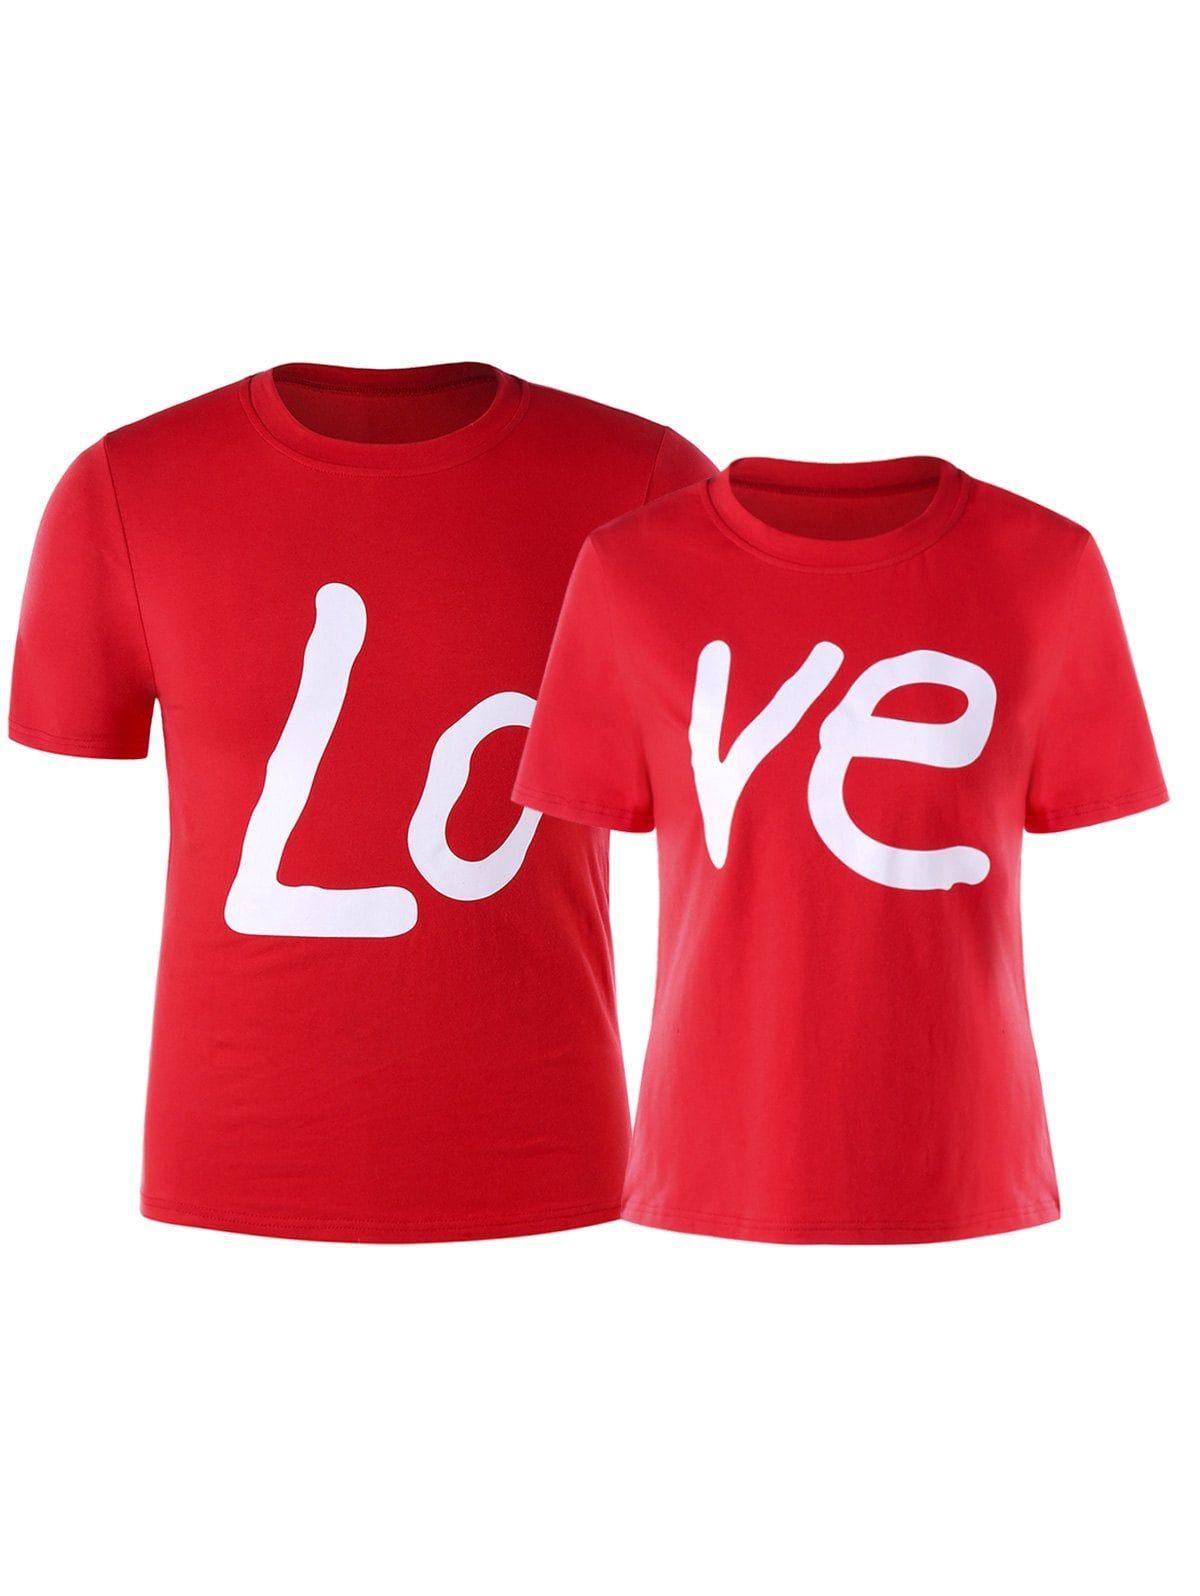 Love Print Matching Couples T Shirt Love T Shirt Couple T Shirt Matching Couple Shirts